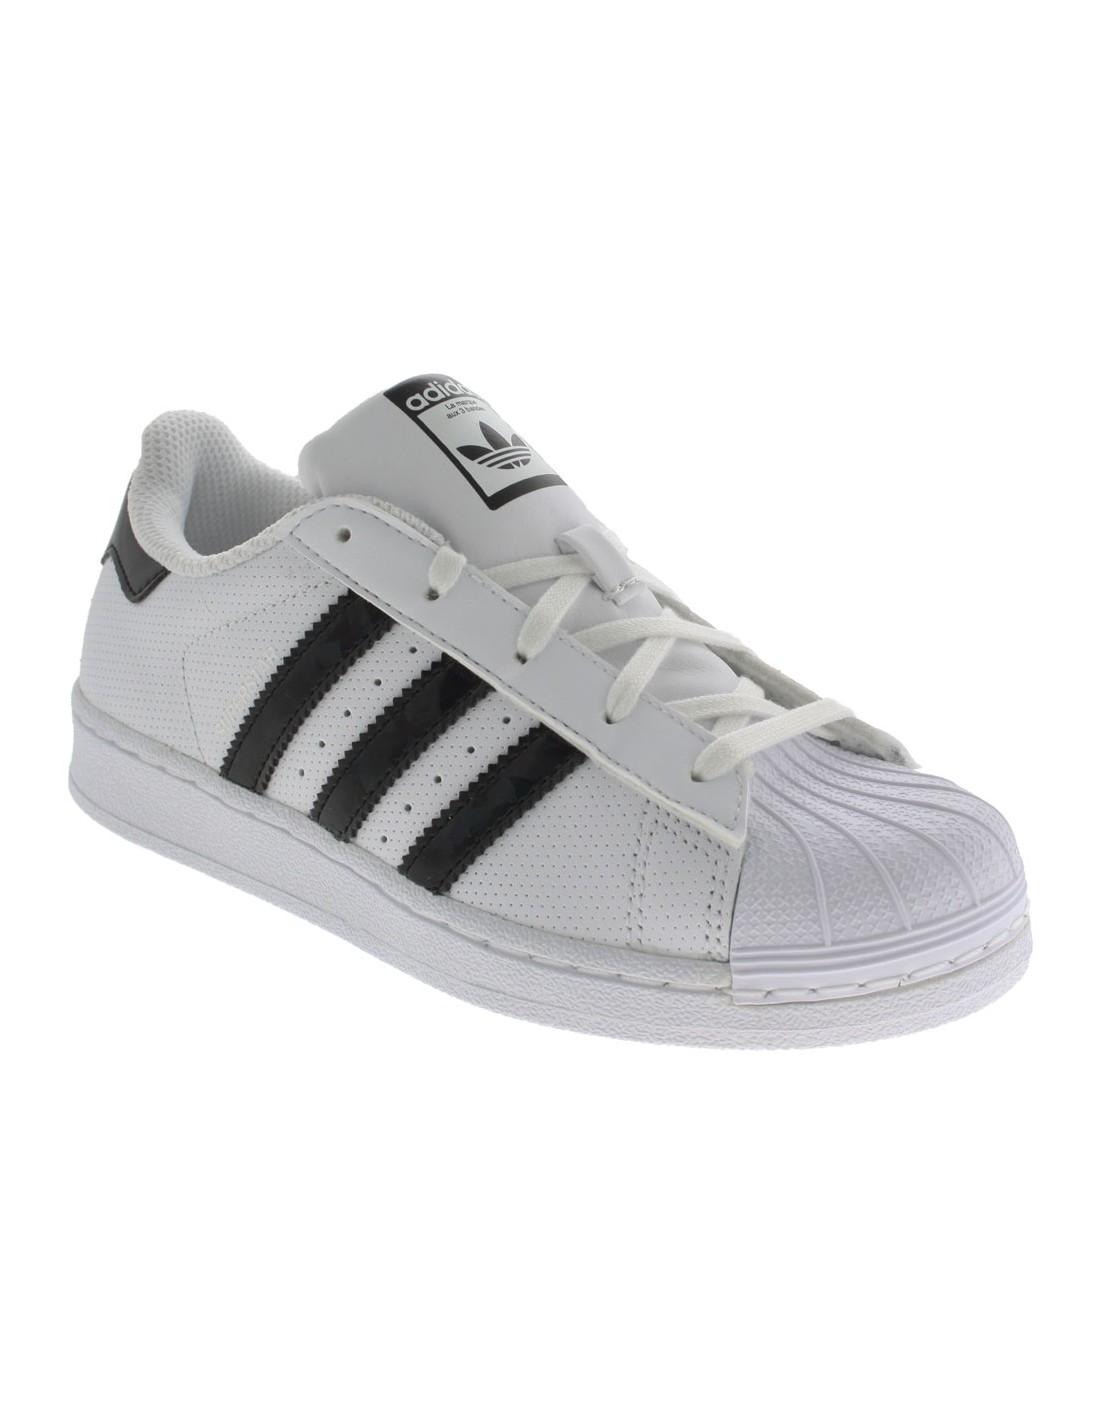 adidas superstar bianco e nere